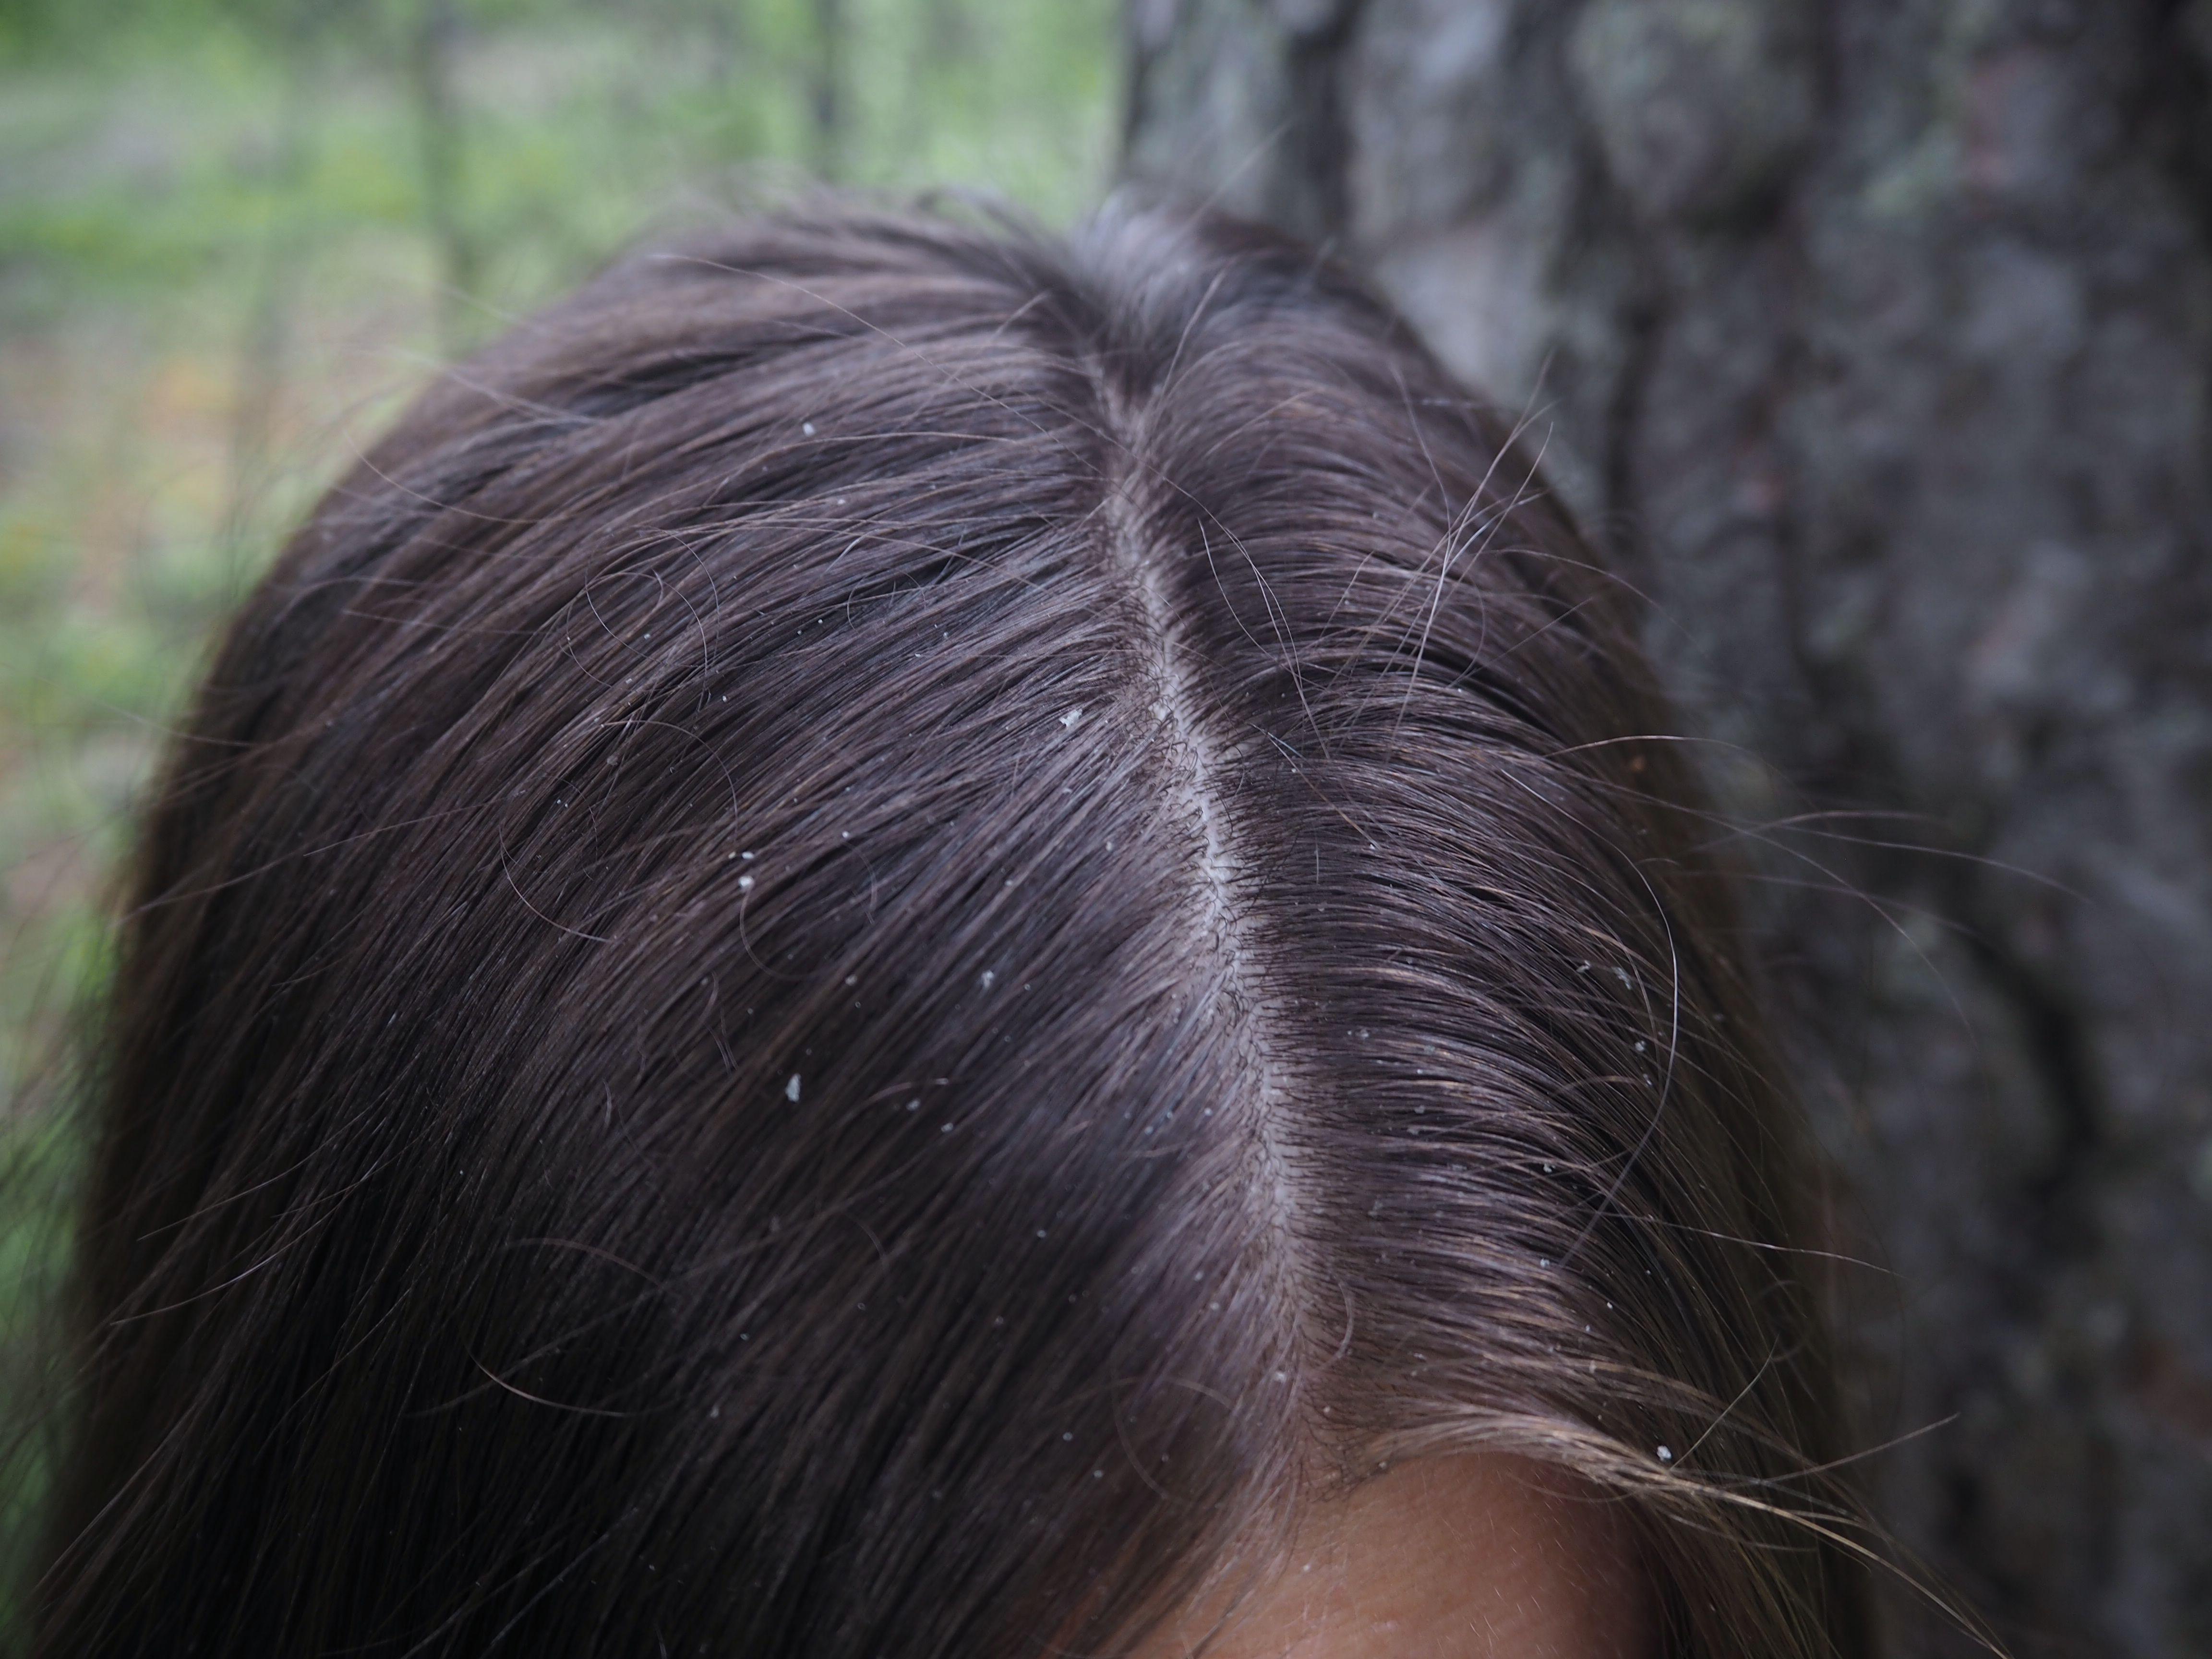 Ongelmana hiuspohja  Tehokasta apua kaikille hiuslaaduille! – Ida ... 364de6ce33